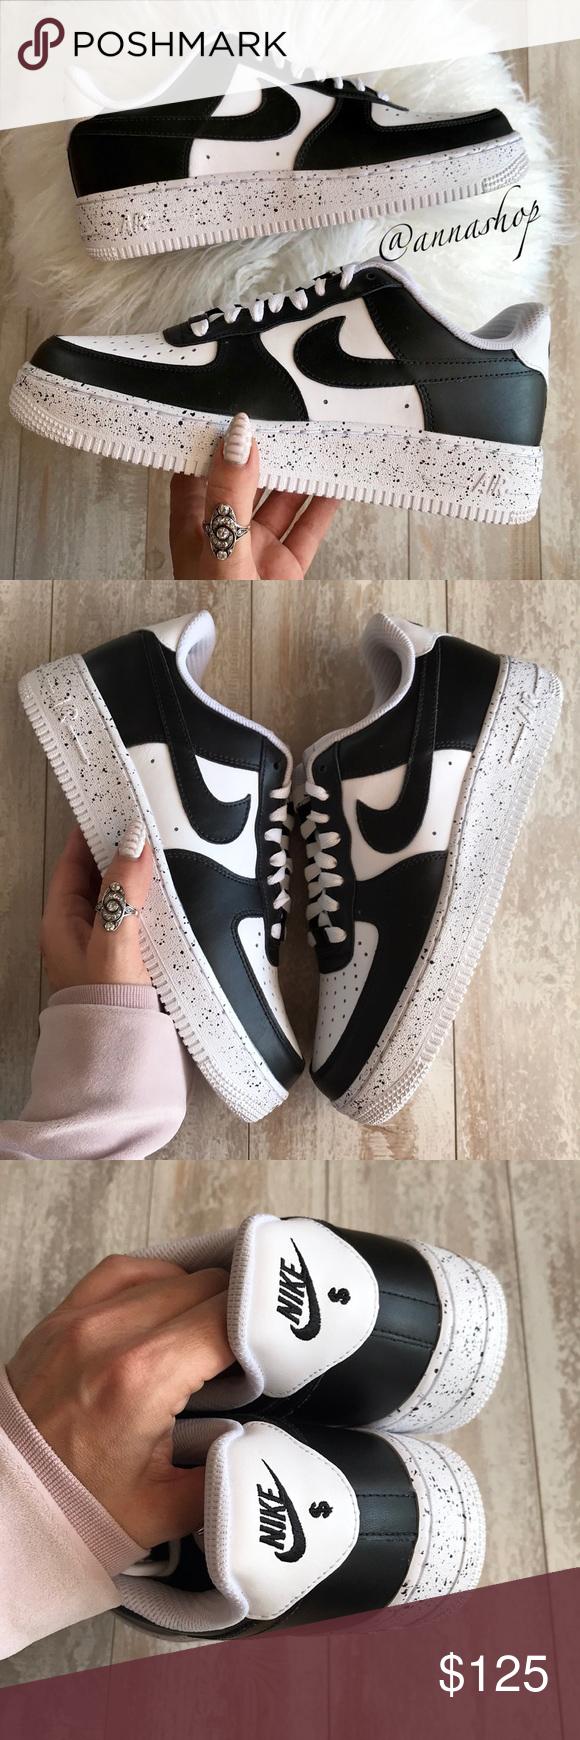 new product 6599d 5fce4 Spotted while shopping on Poshmark  NWT Nike ID Air Force 1 Custom Oreo!   poshmark  fashion  shopping  style  Nike  Shoes